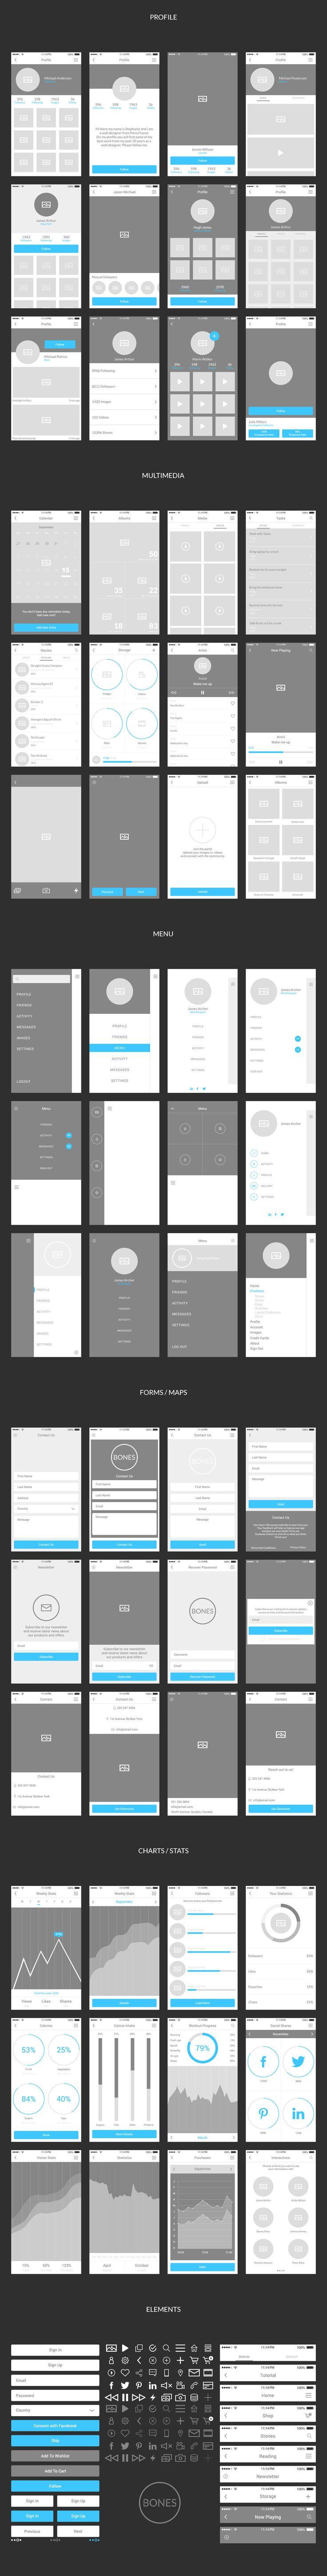 Bones IOS Wireframe Kit #ios #mobile #android #ui #ux #app #application #iphone #wireframe #photoshop #illustrator #graphics #webelements #wireframe #webelementskit #fashion #multimedia #blog #ecommerce